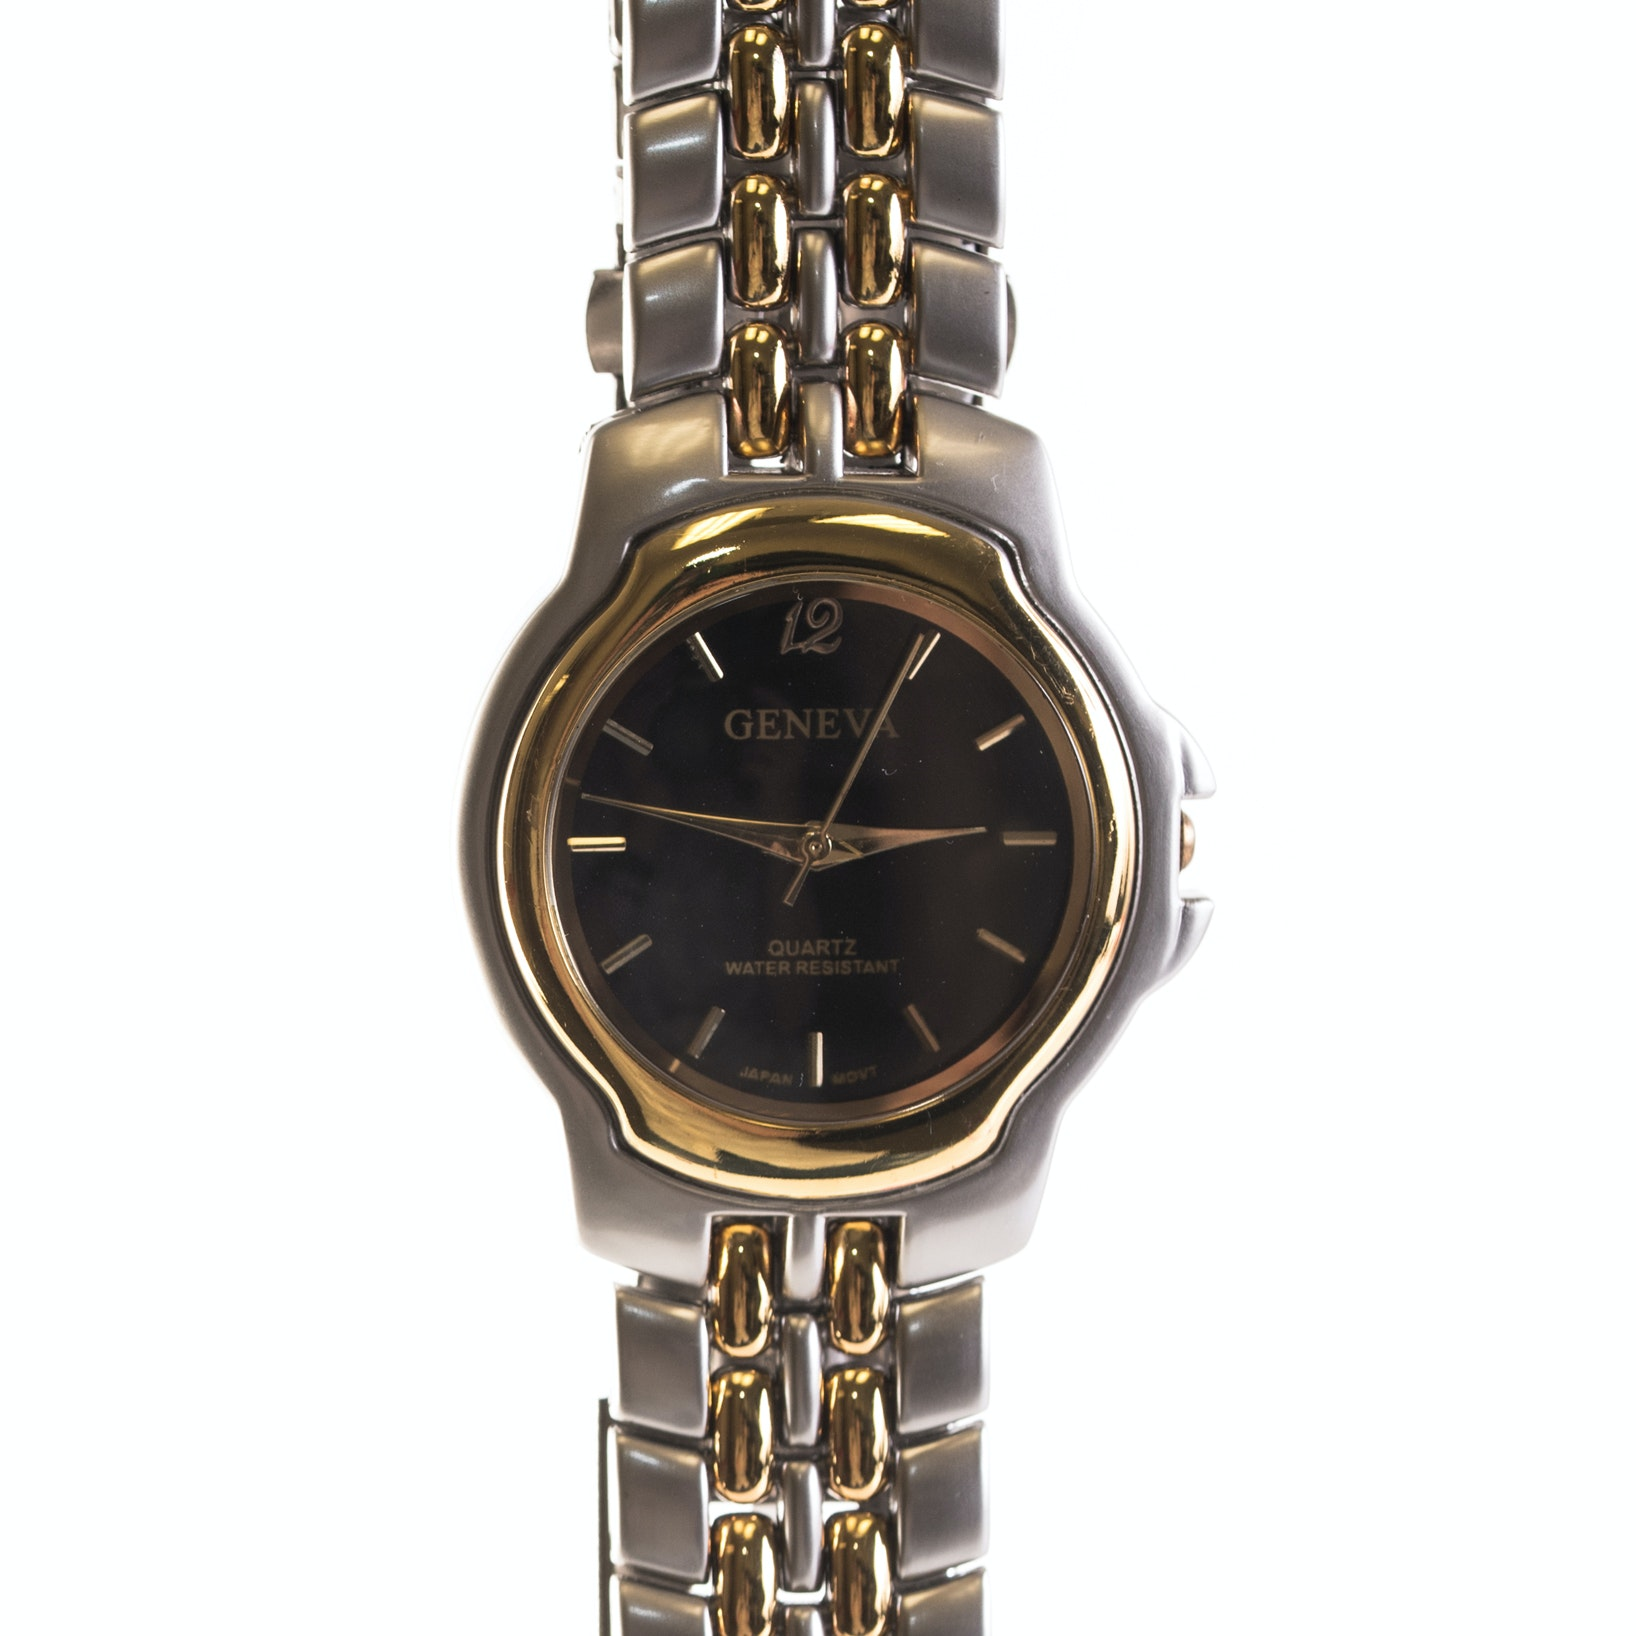 Geneva Stainless Steel Wristwatch